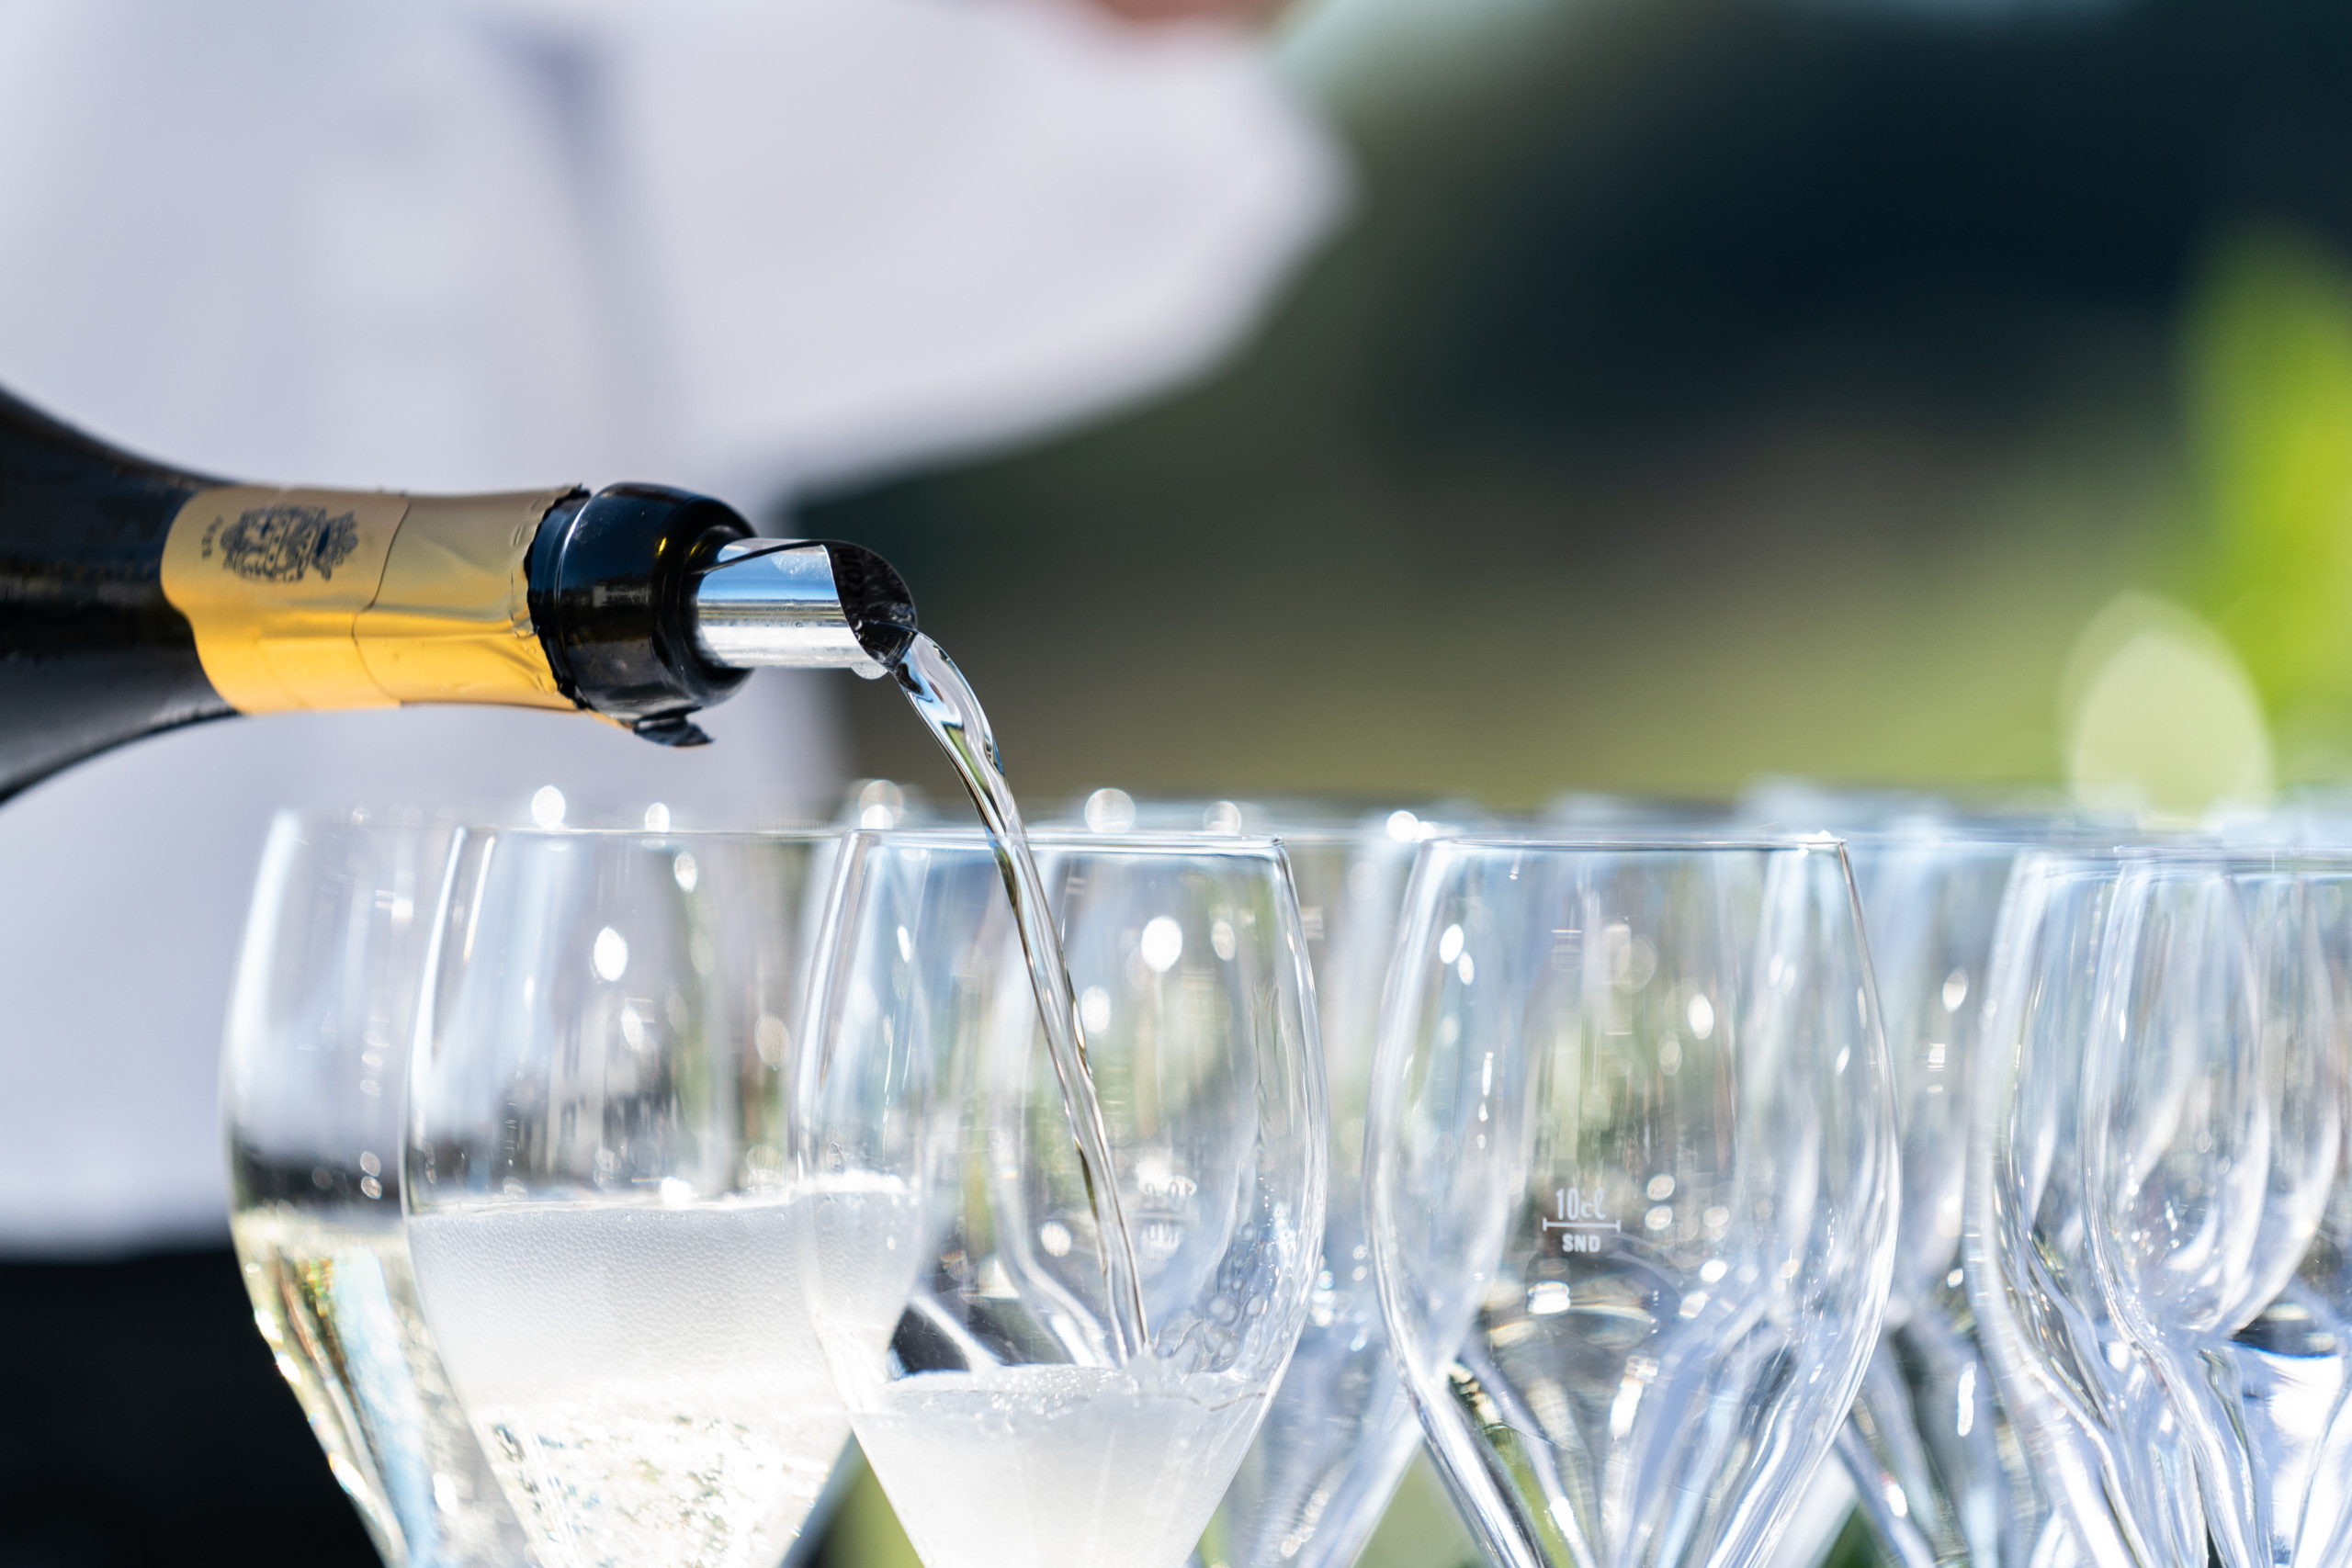 Forel Datingseite Kostenlos Flirten In Burgdorf Single Date Gipf